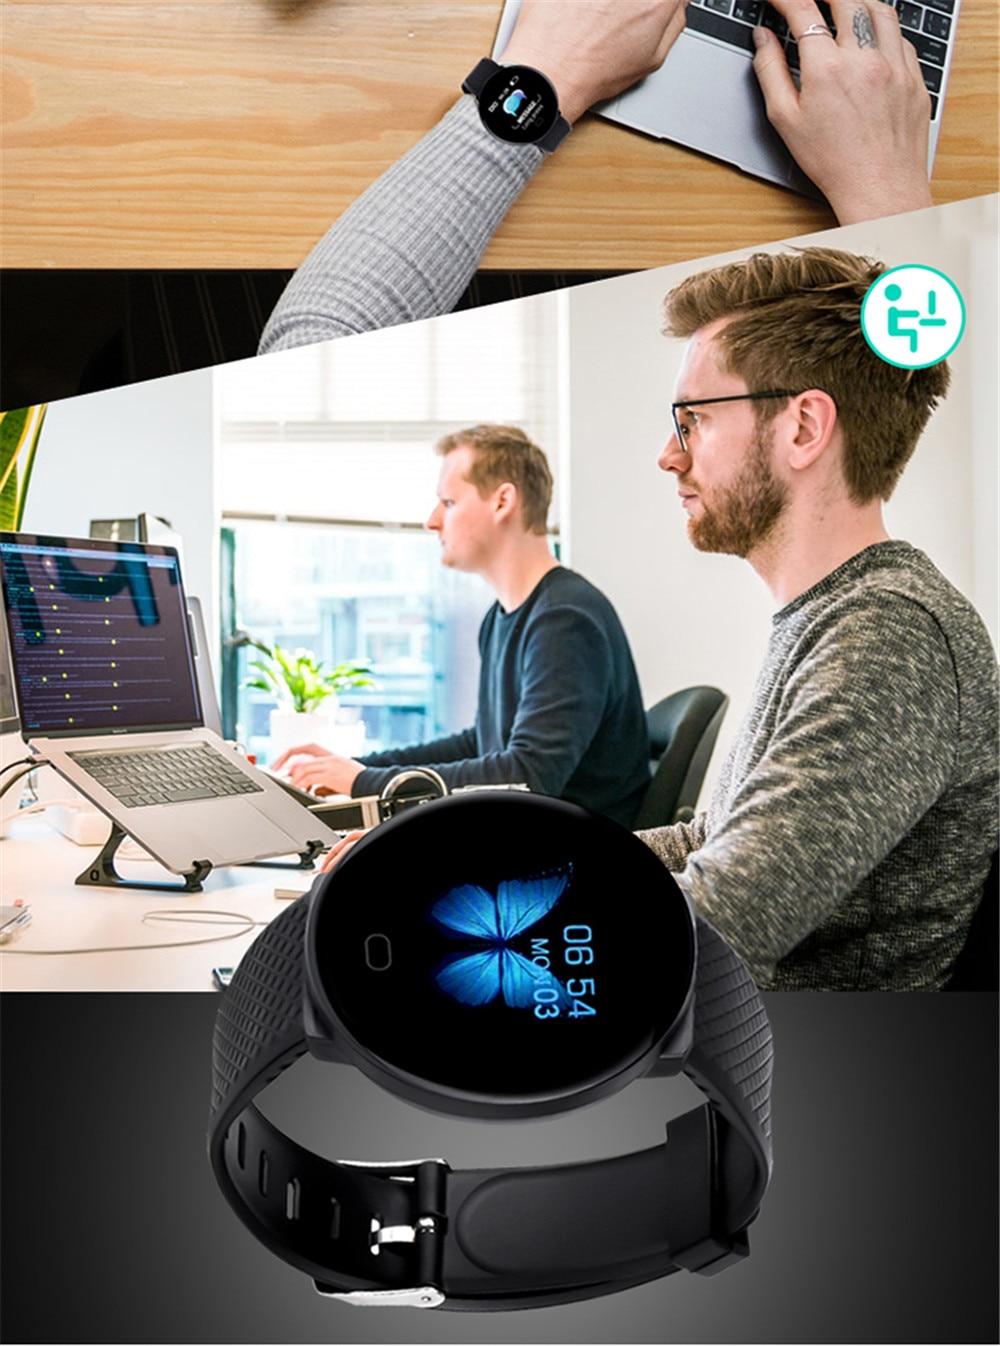 H60007e3d3df840dc8dd6ab0698ccea41q Smart Bracelet 1.3'' Screen Pedometer Fitness Tracker Ip67 Waterproof Blood Pressure Heart Rate Monitor Smart Band Women Men